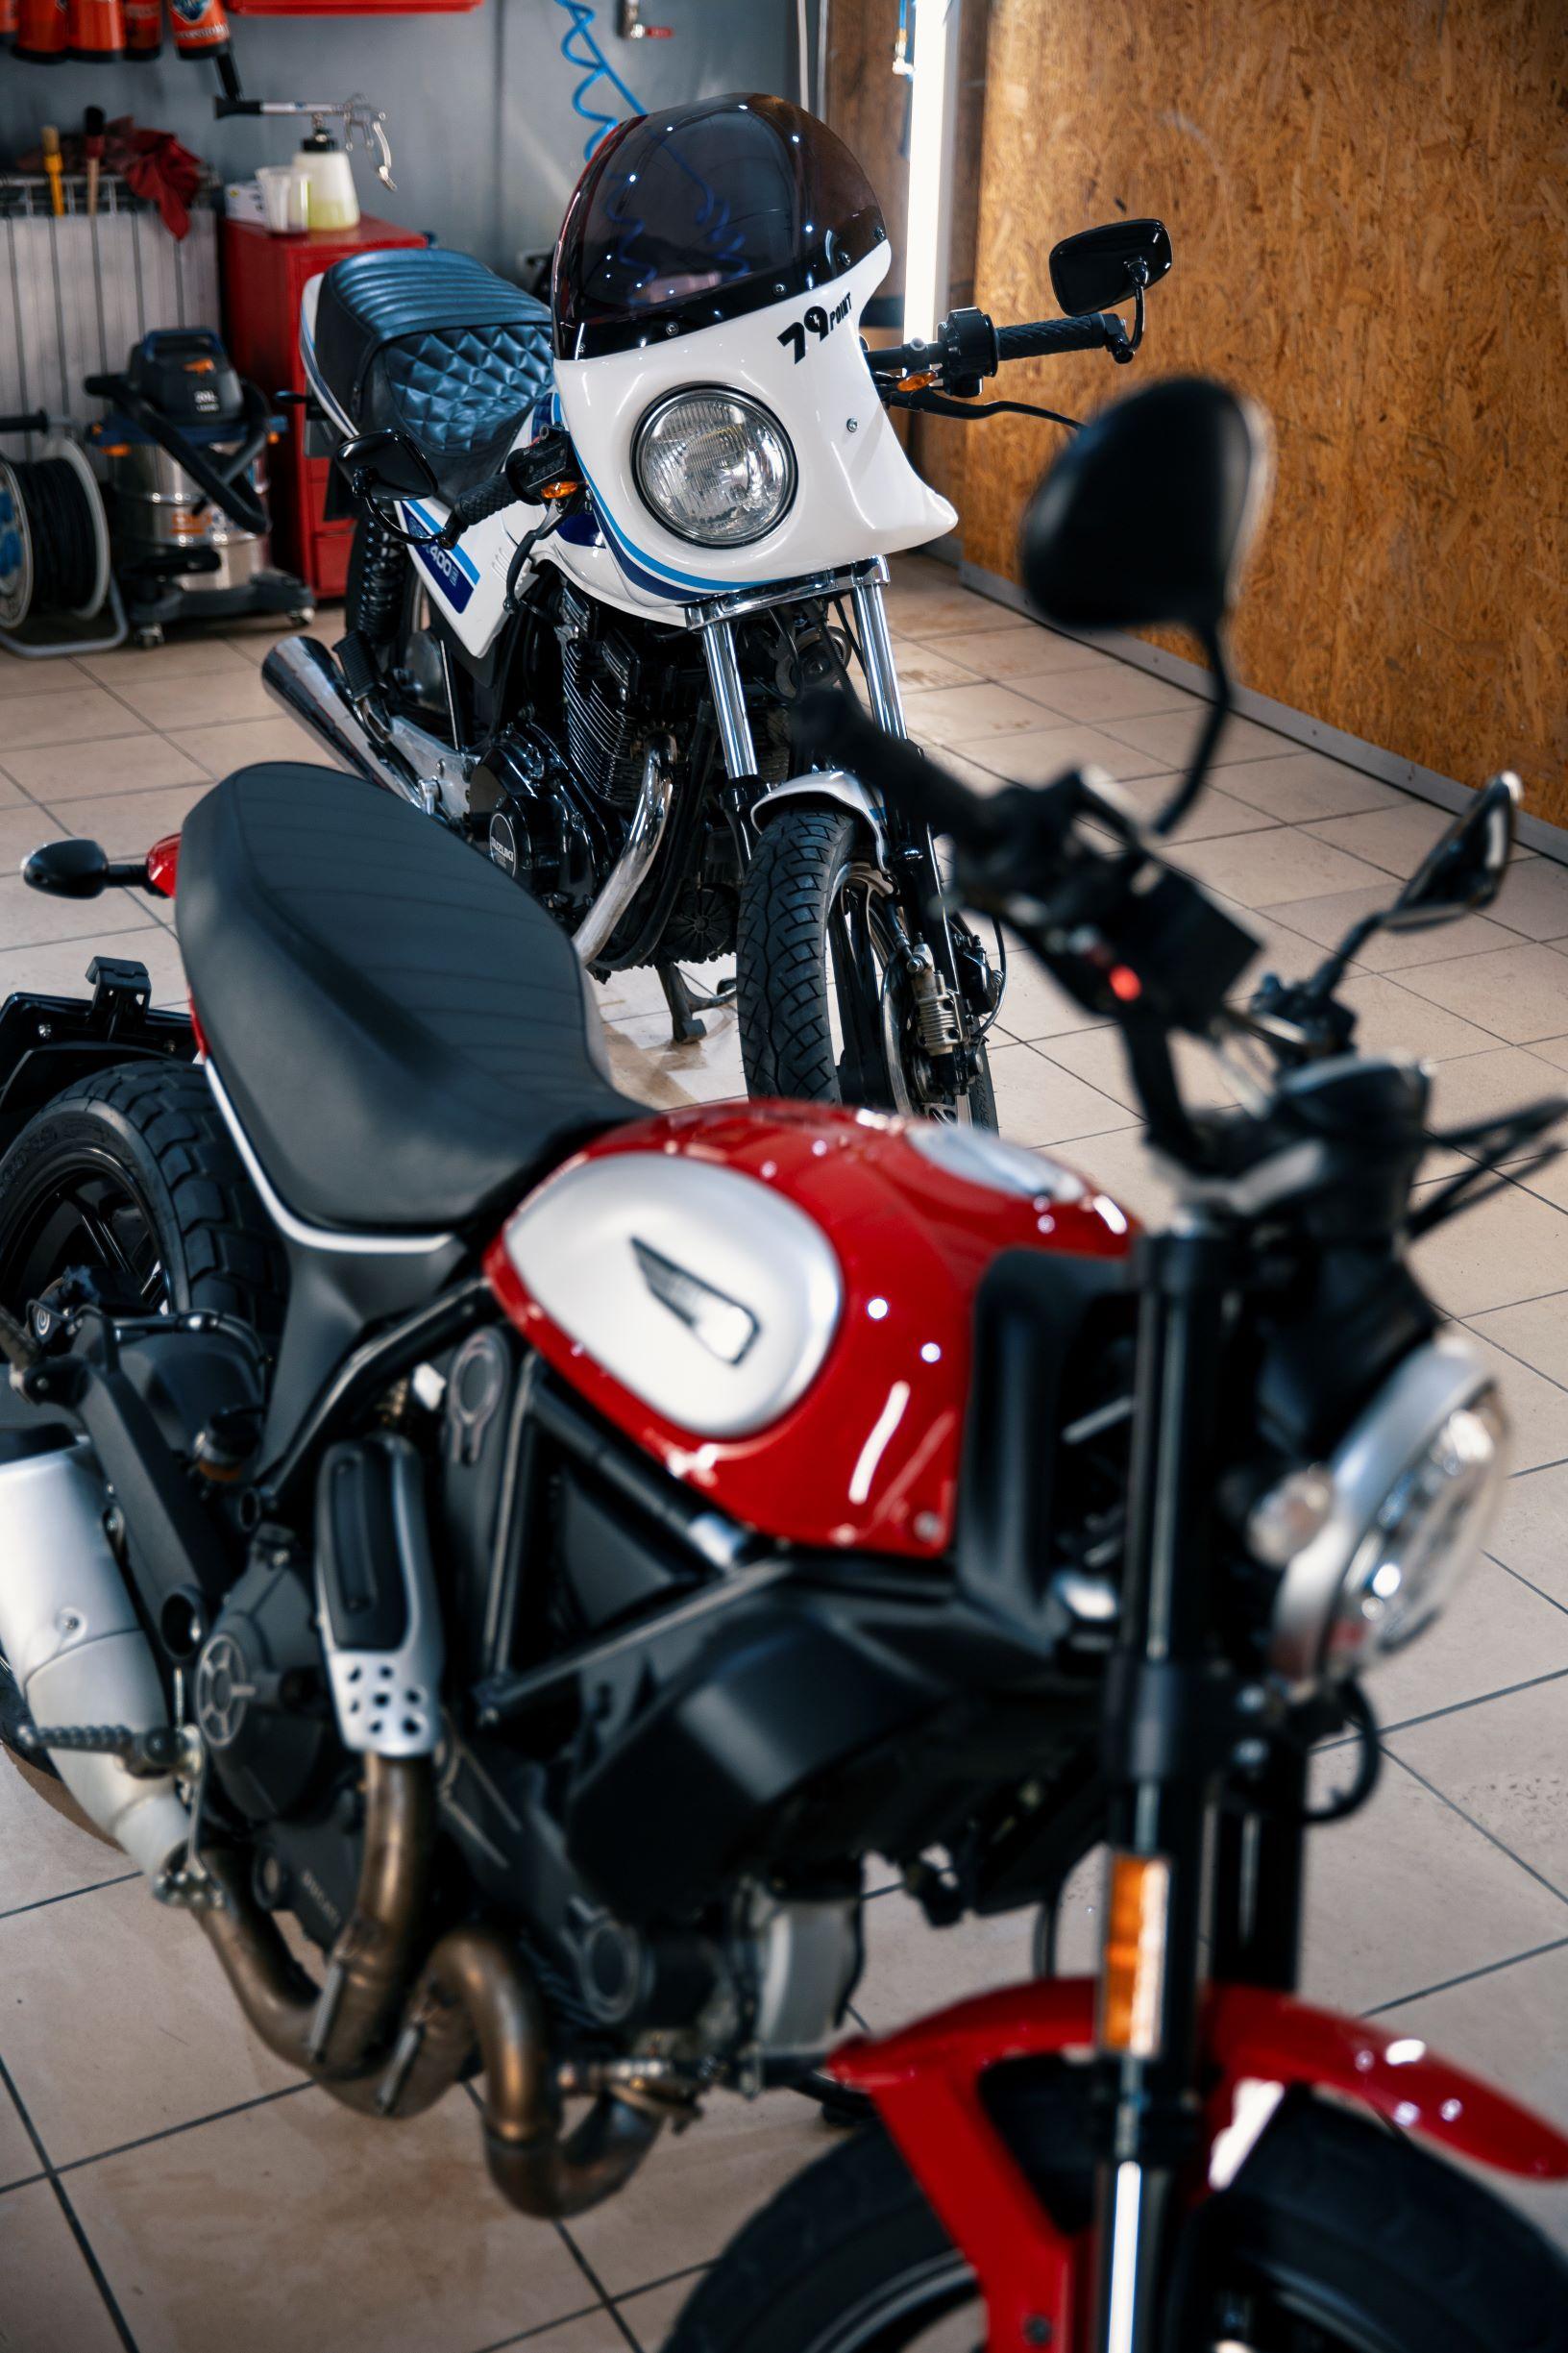 Motocykle Ducati Scrambler i Suzuki gsx